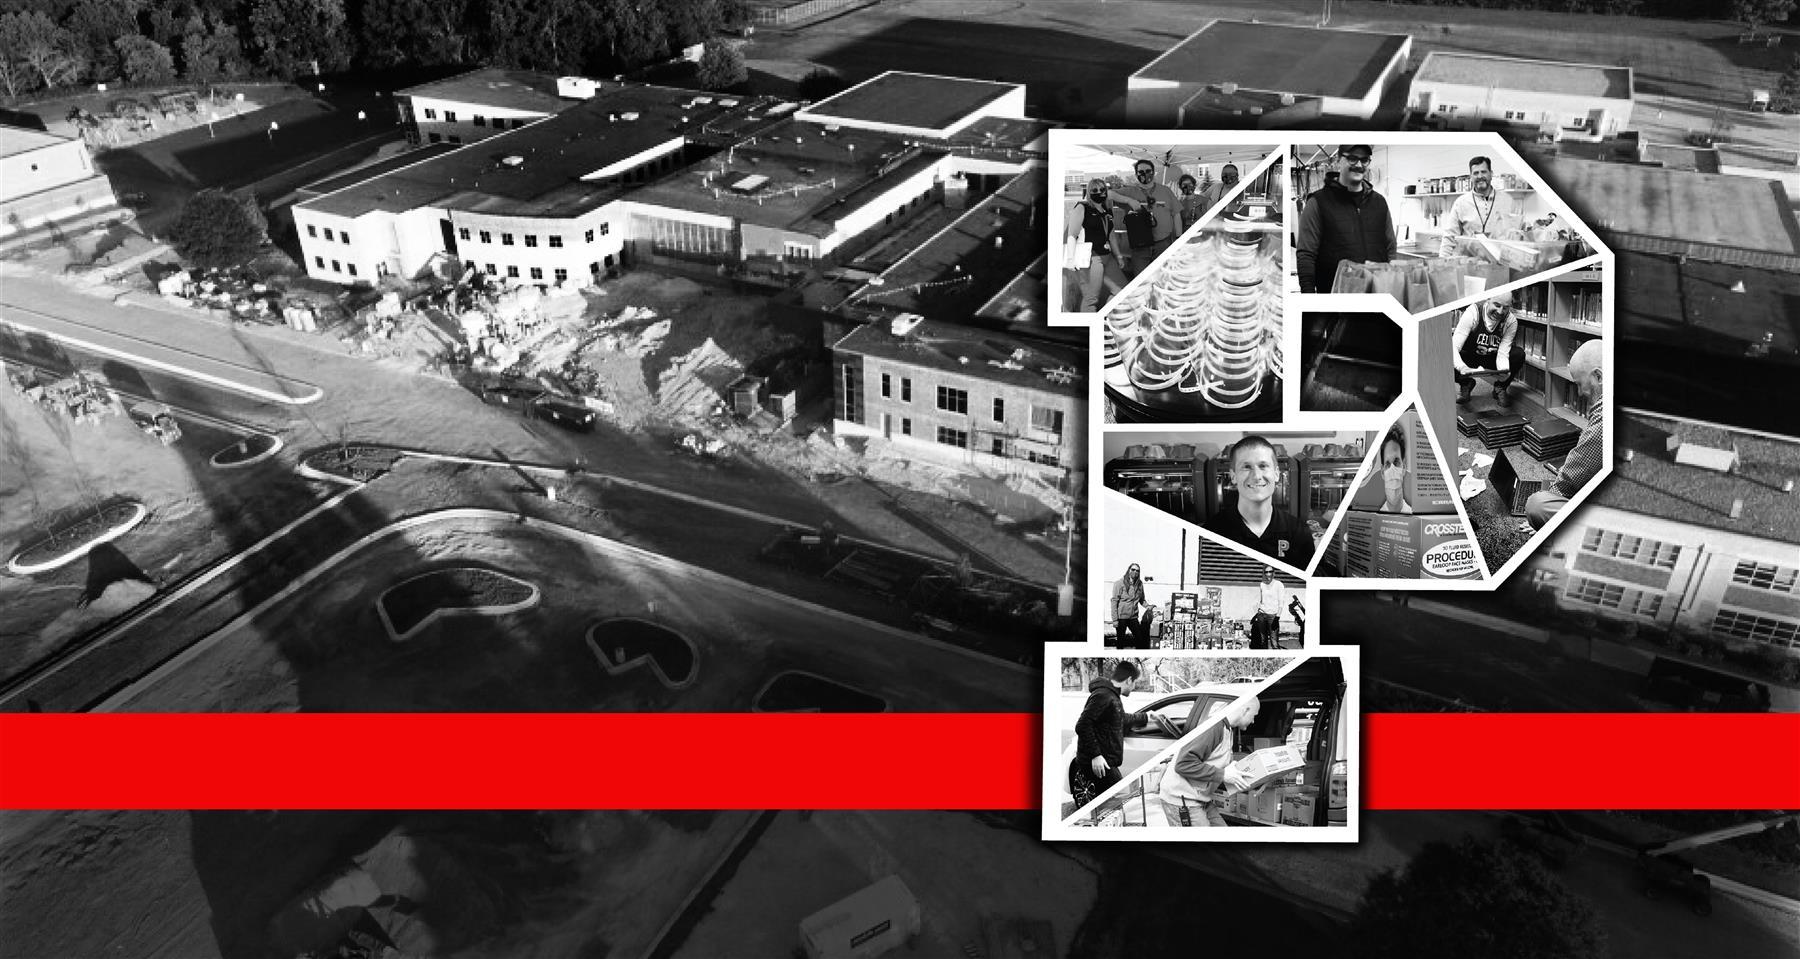 Pewaukee Middle School 2020 Christmas Break Pewaukee School District / Homepage